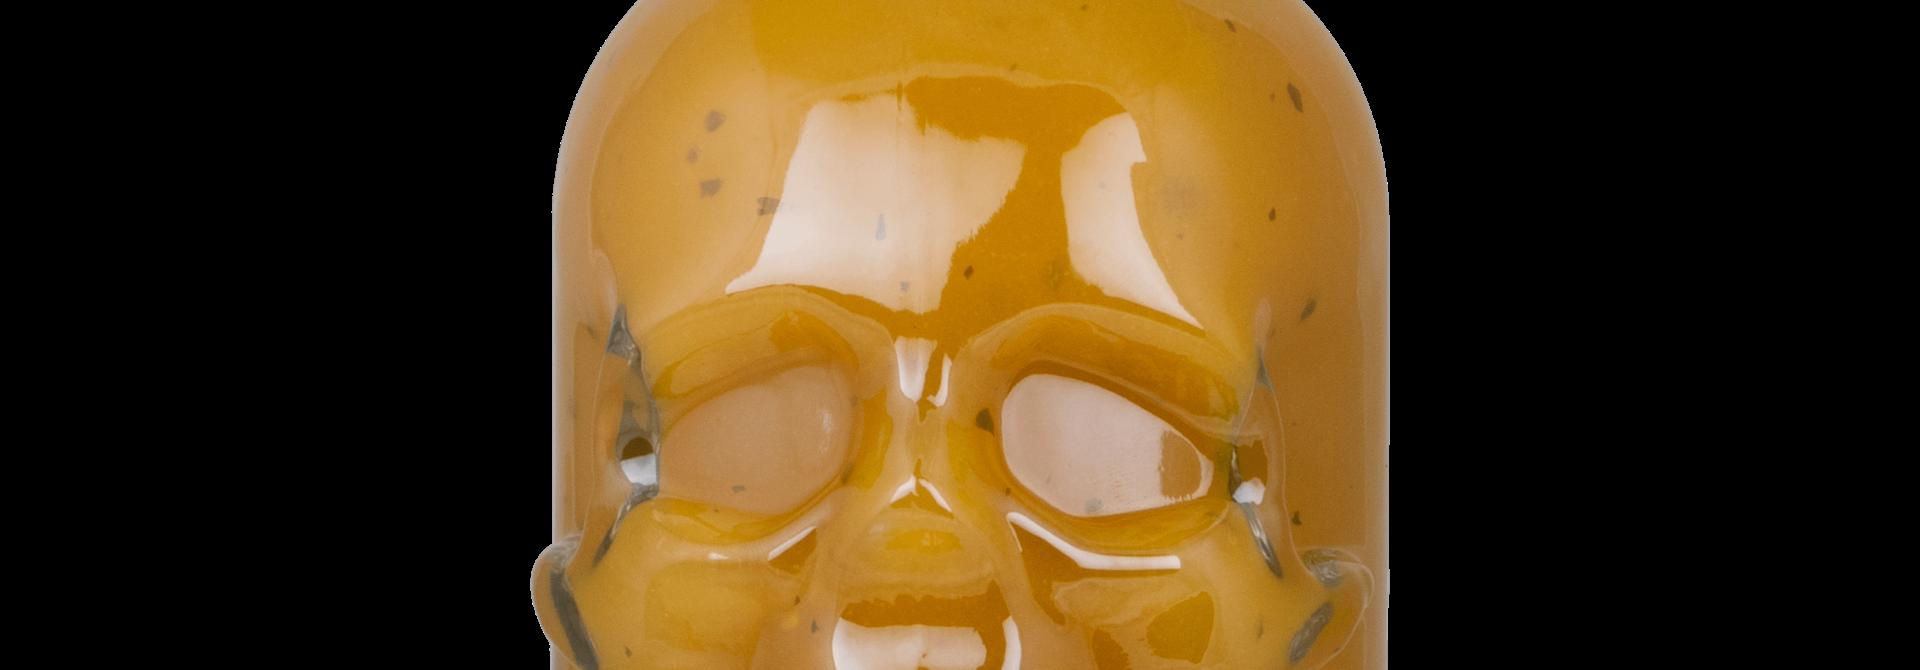 Skull Hot Sauce Mexican Habanero Fever